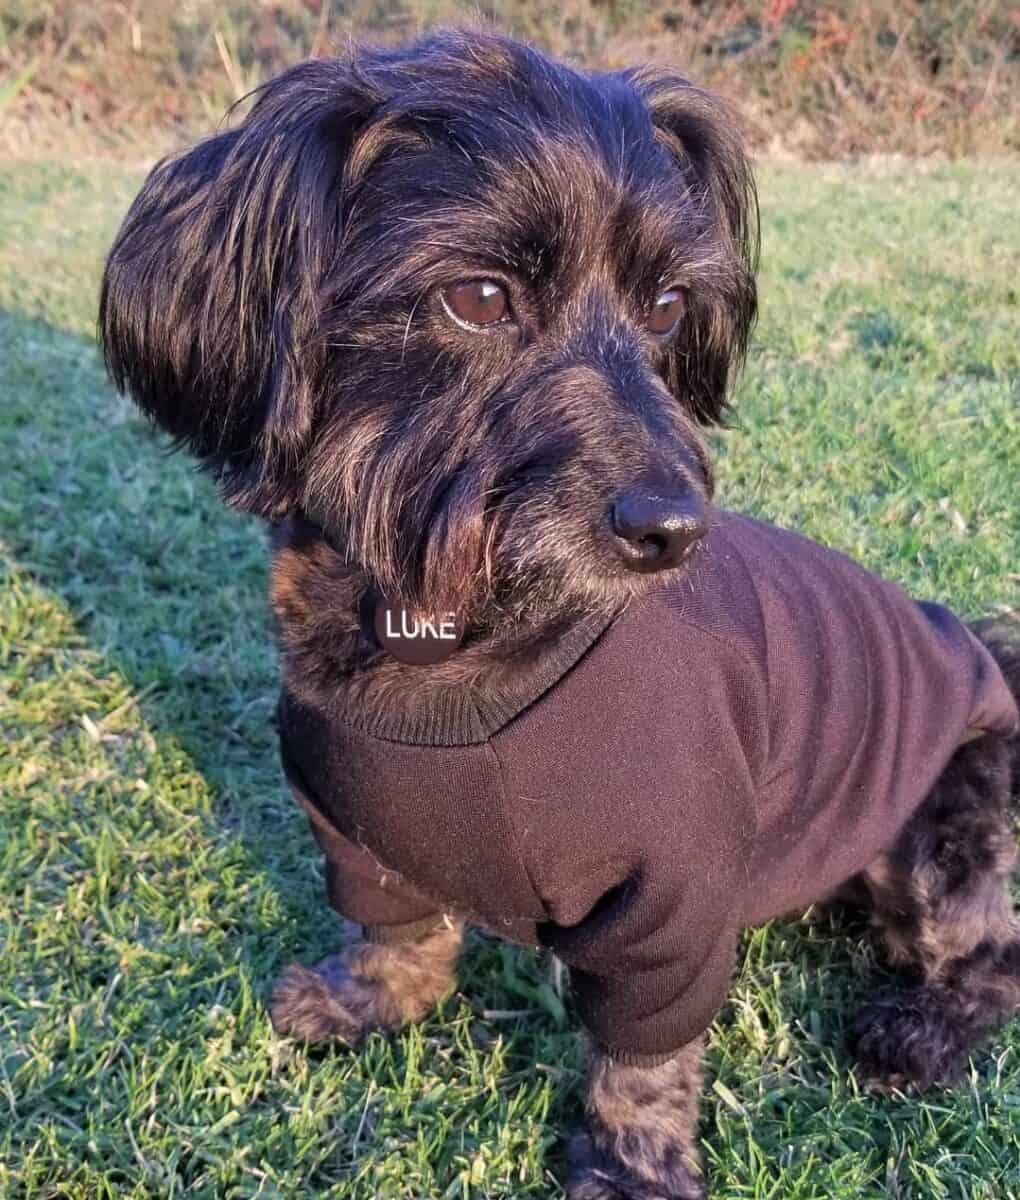 Black Terrier Poodle mix wearing dog shirt